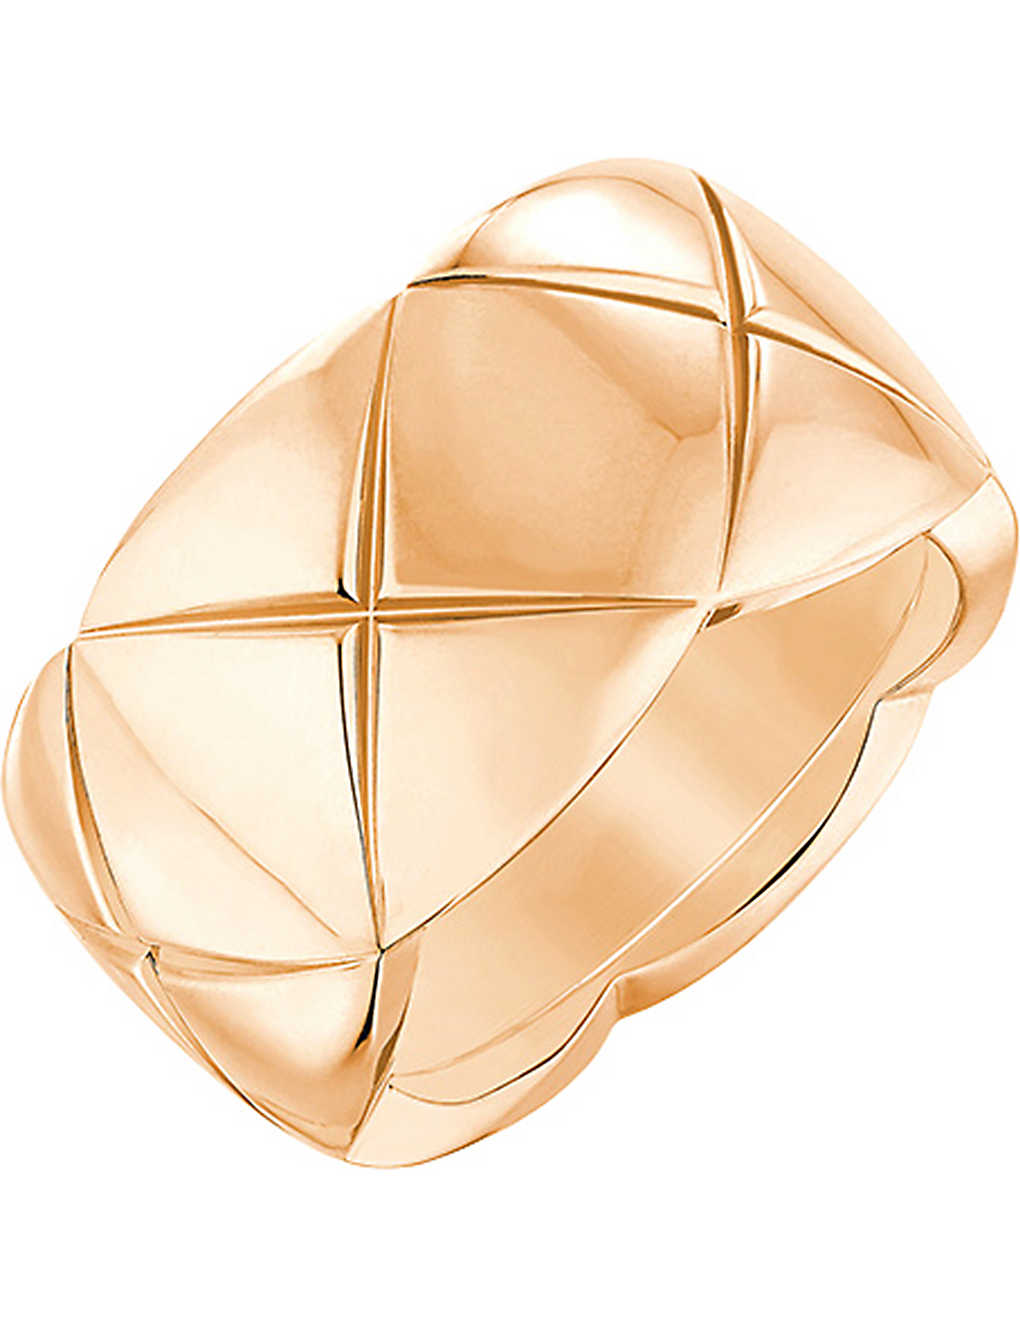 CHANEL - Coco Crush 18K beige gold ring. Medium version  db038697b2079